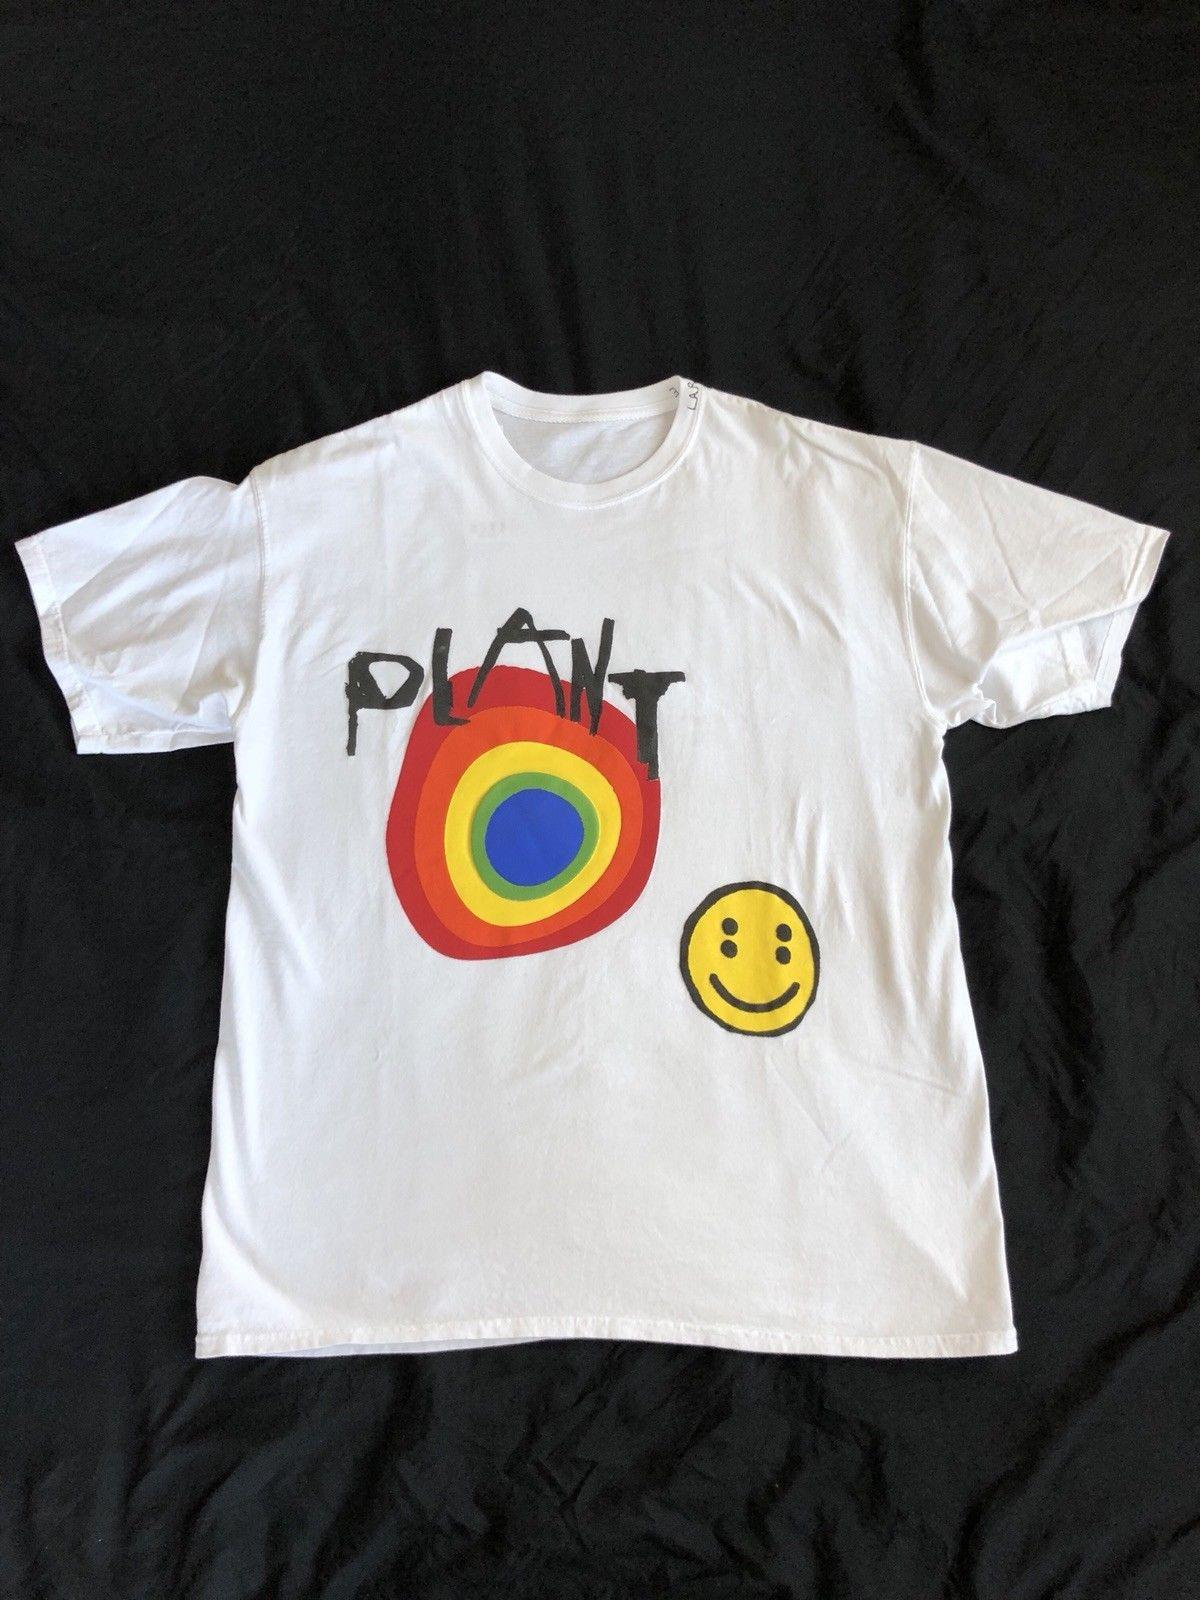 8f116264cd Cactus Plant Flea Market - Core Melt T Shirt Tee Sz Large Pharrell Men  Women Unisex Fashion tshirt Free Shipping